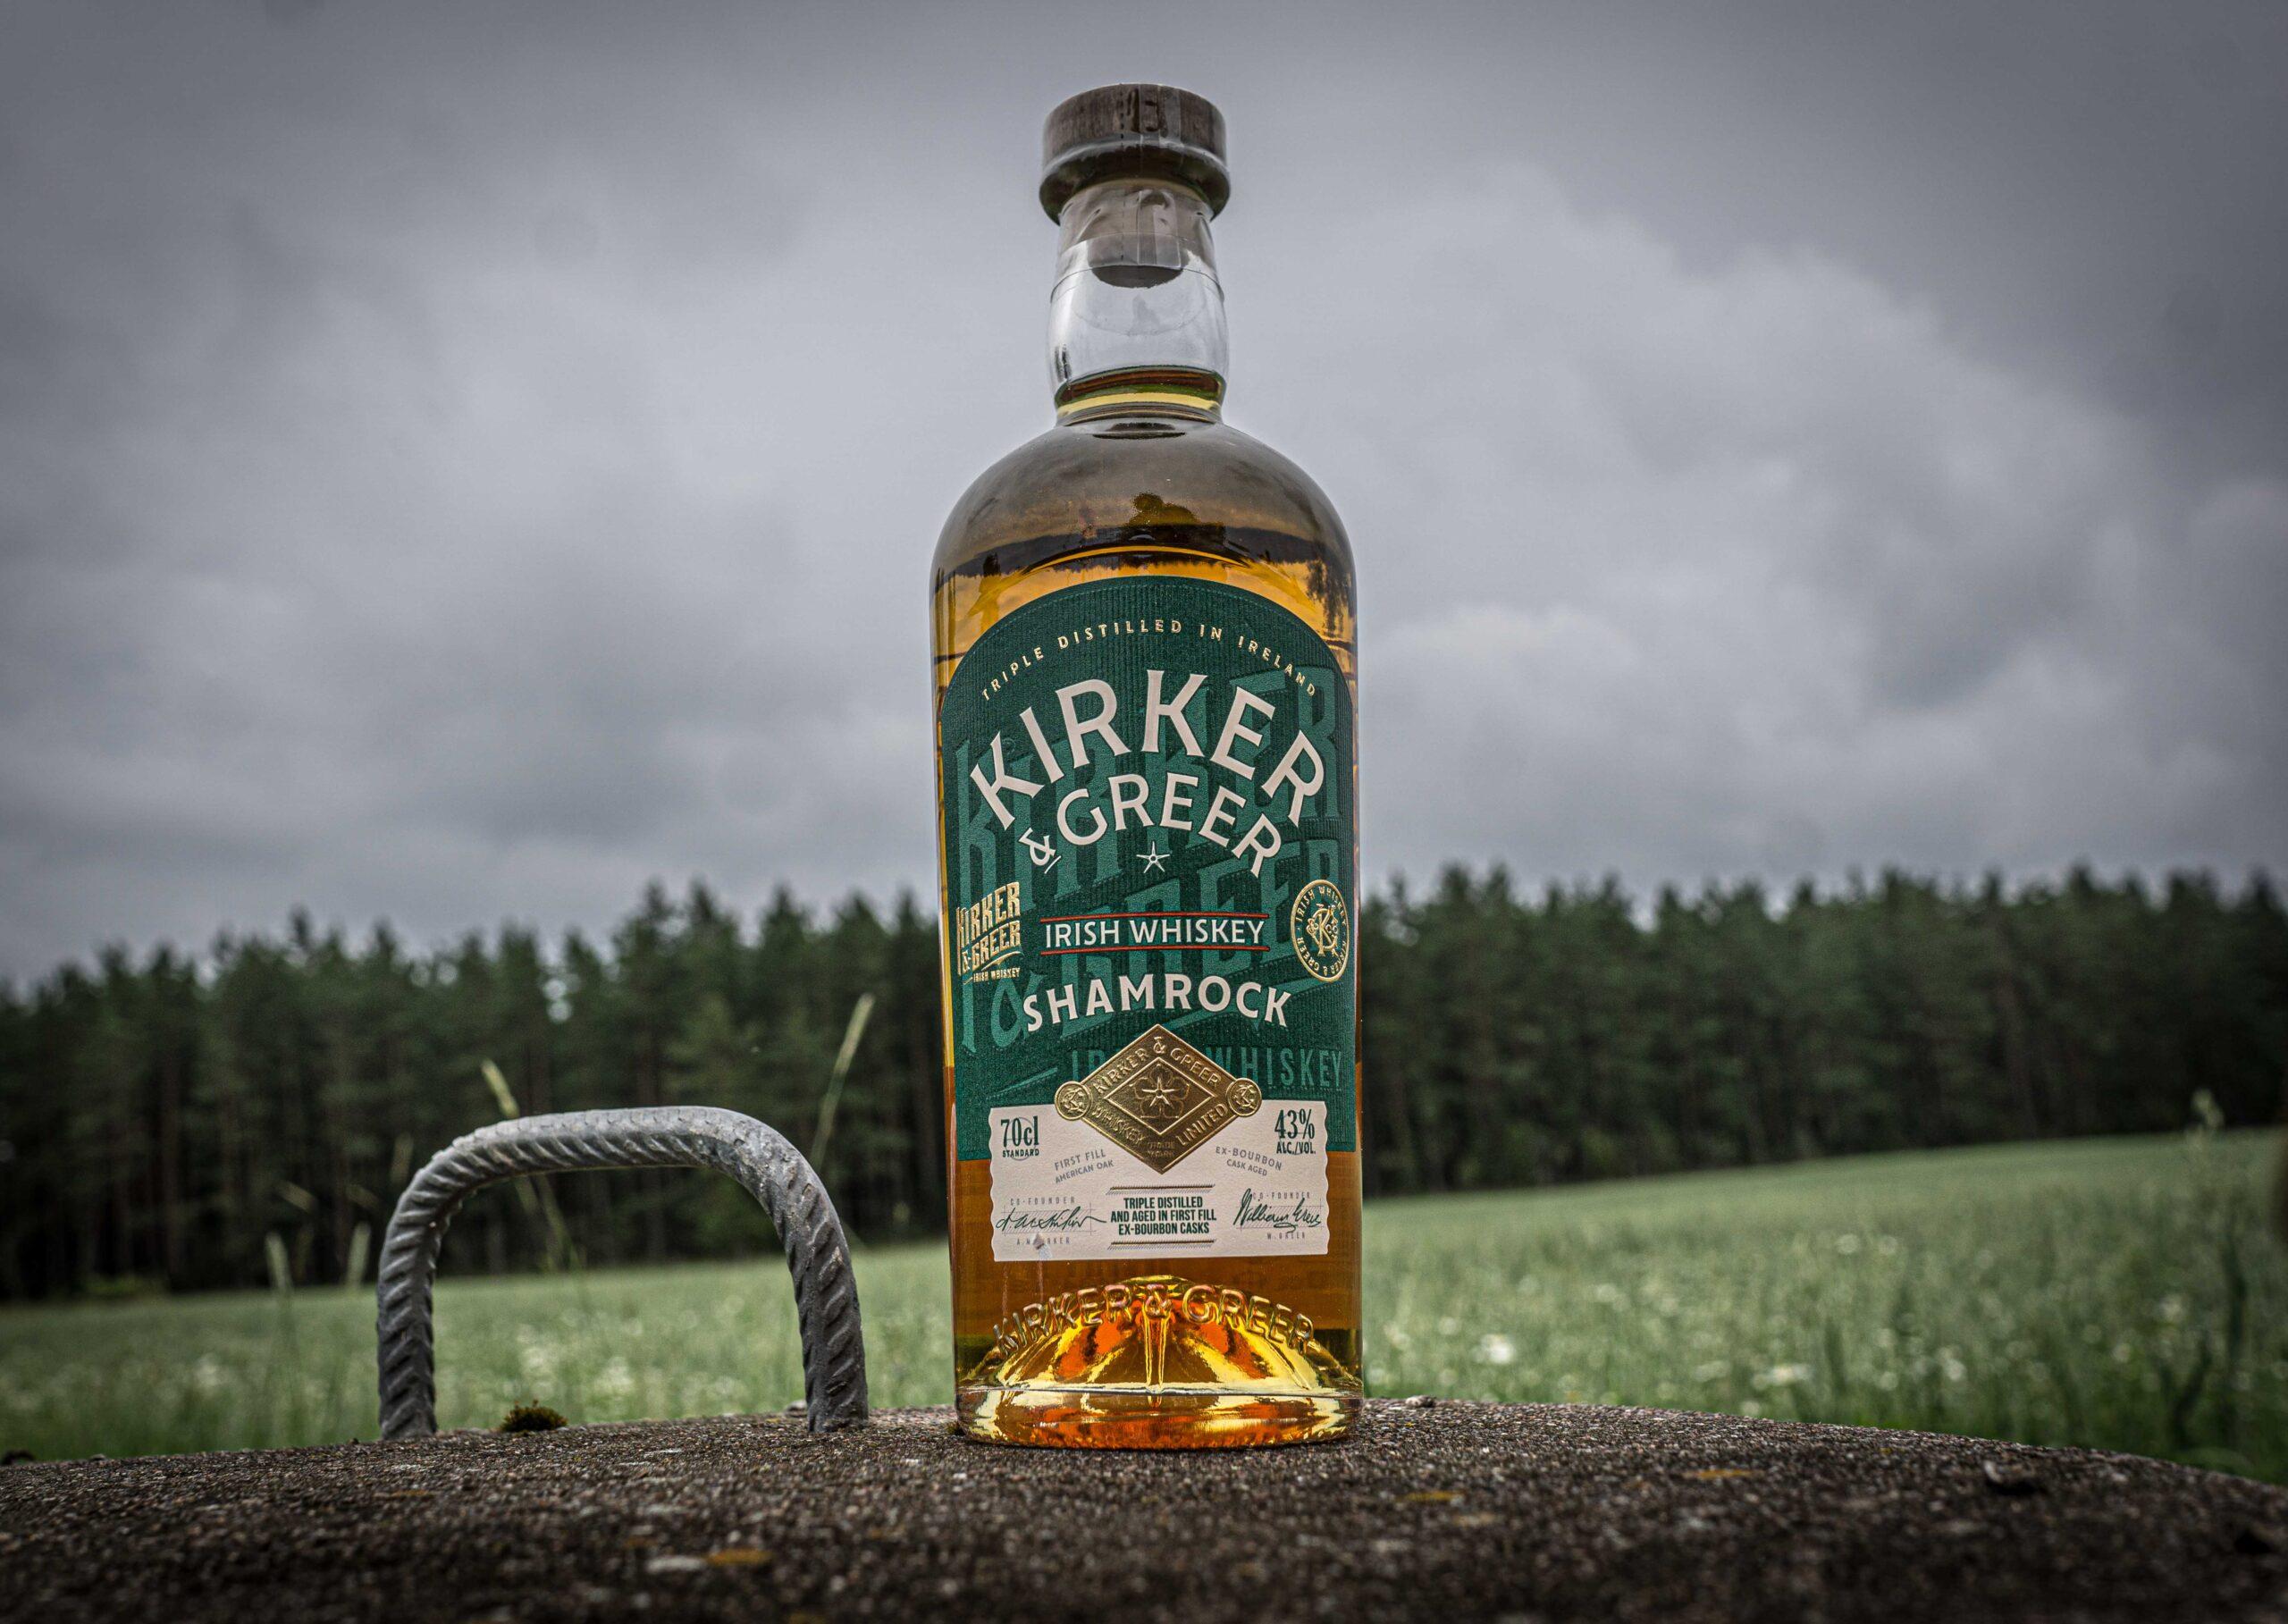 Kirker & Gerer Shamrock Irish Whiskey